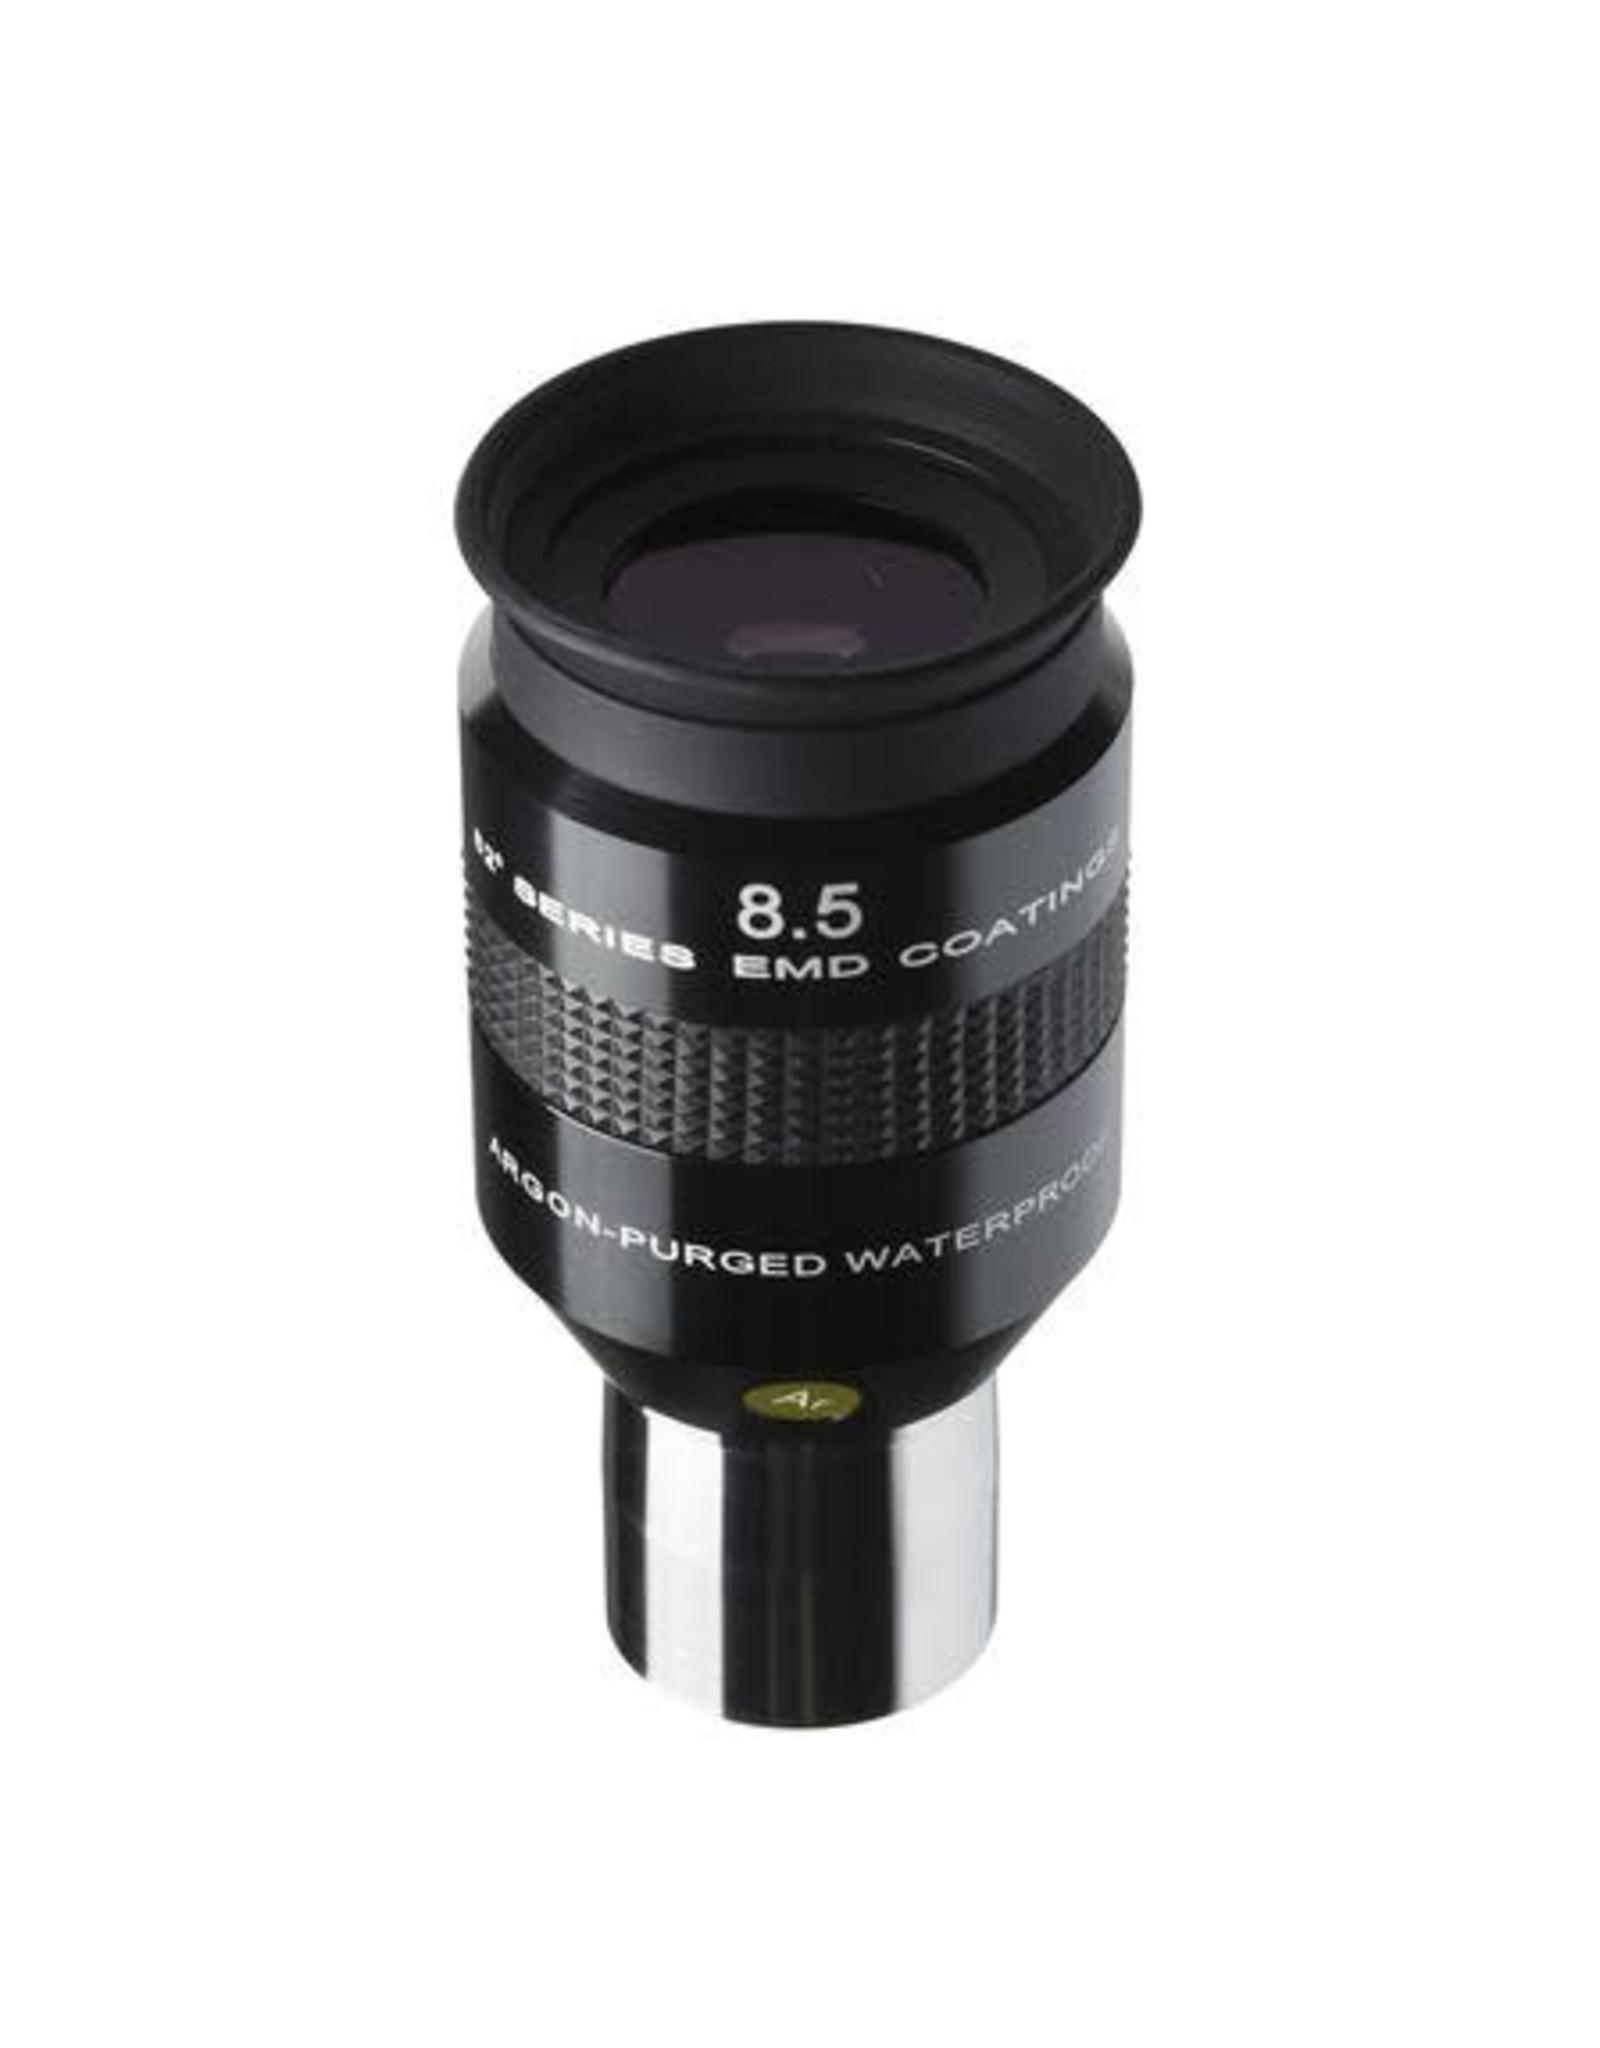 Explore Scientific Explore Scientific 8.5mm 82° Series LER Waterproof Eyepiece